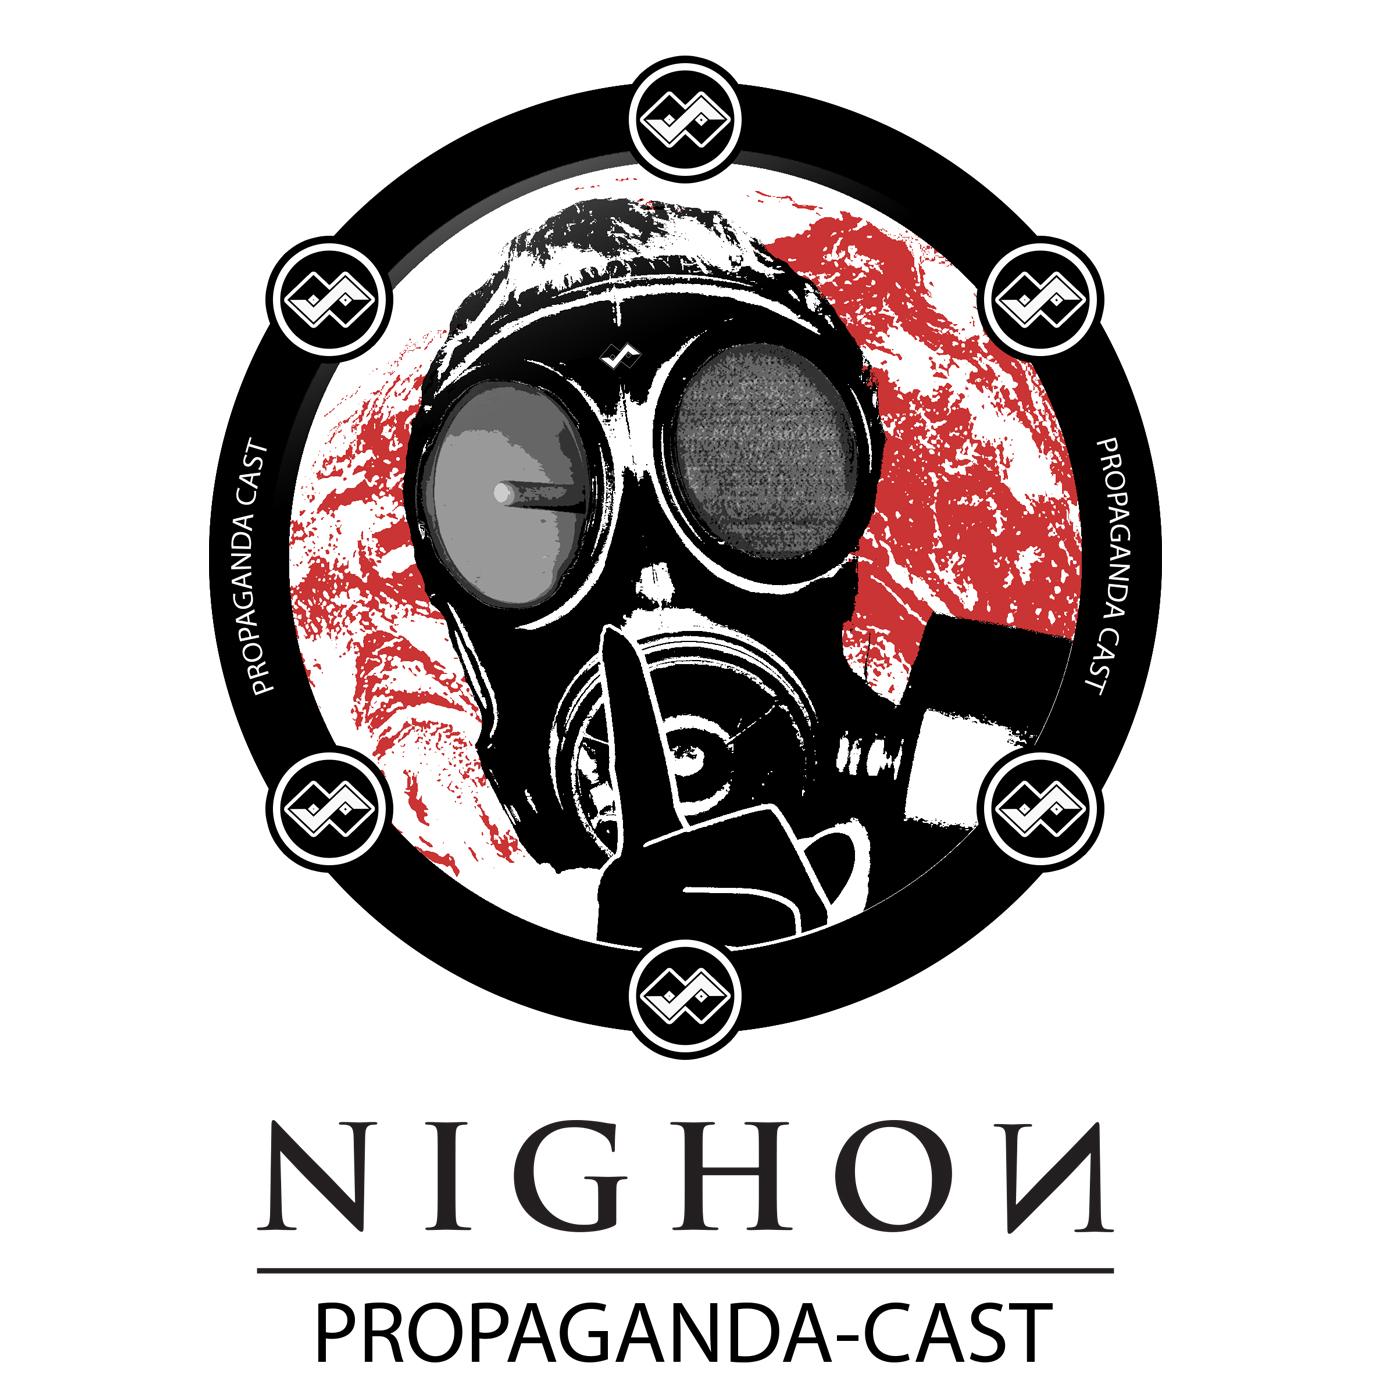 NIGHON - Propaganda-cast